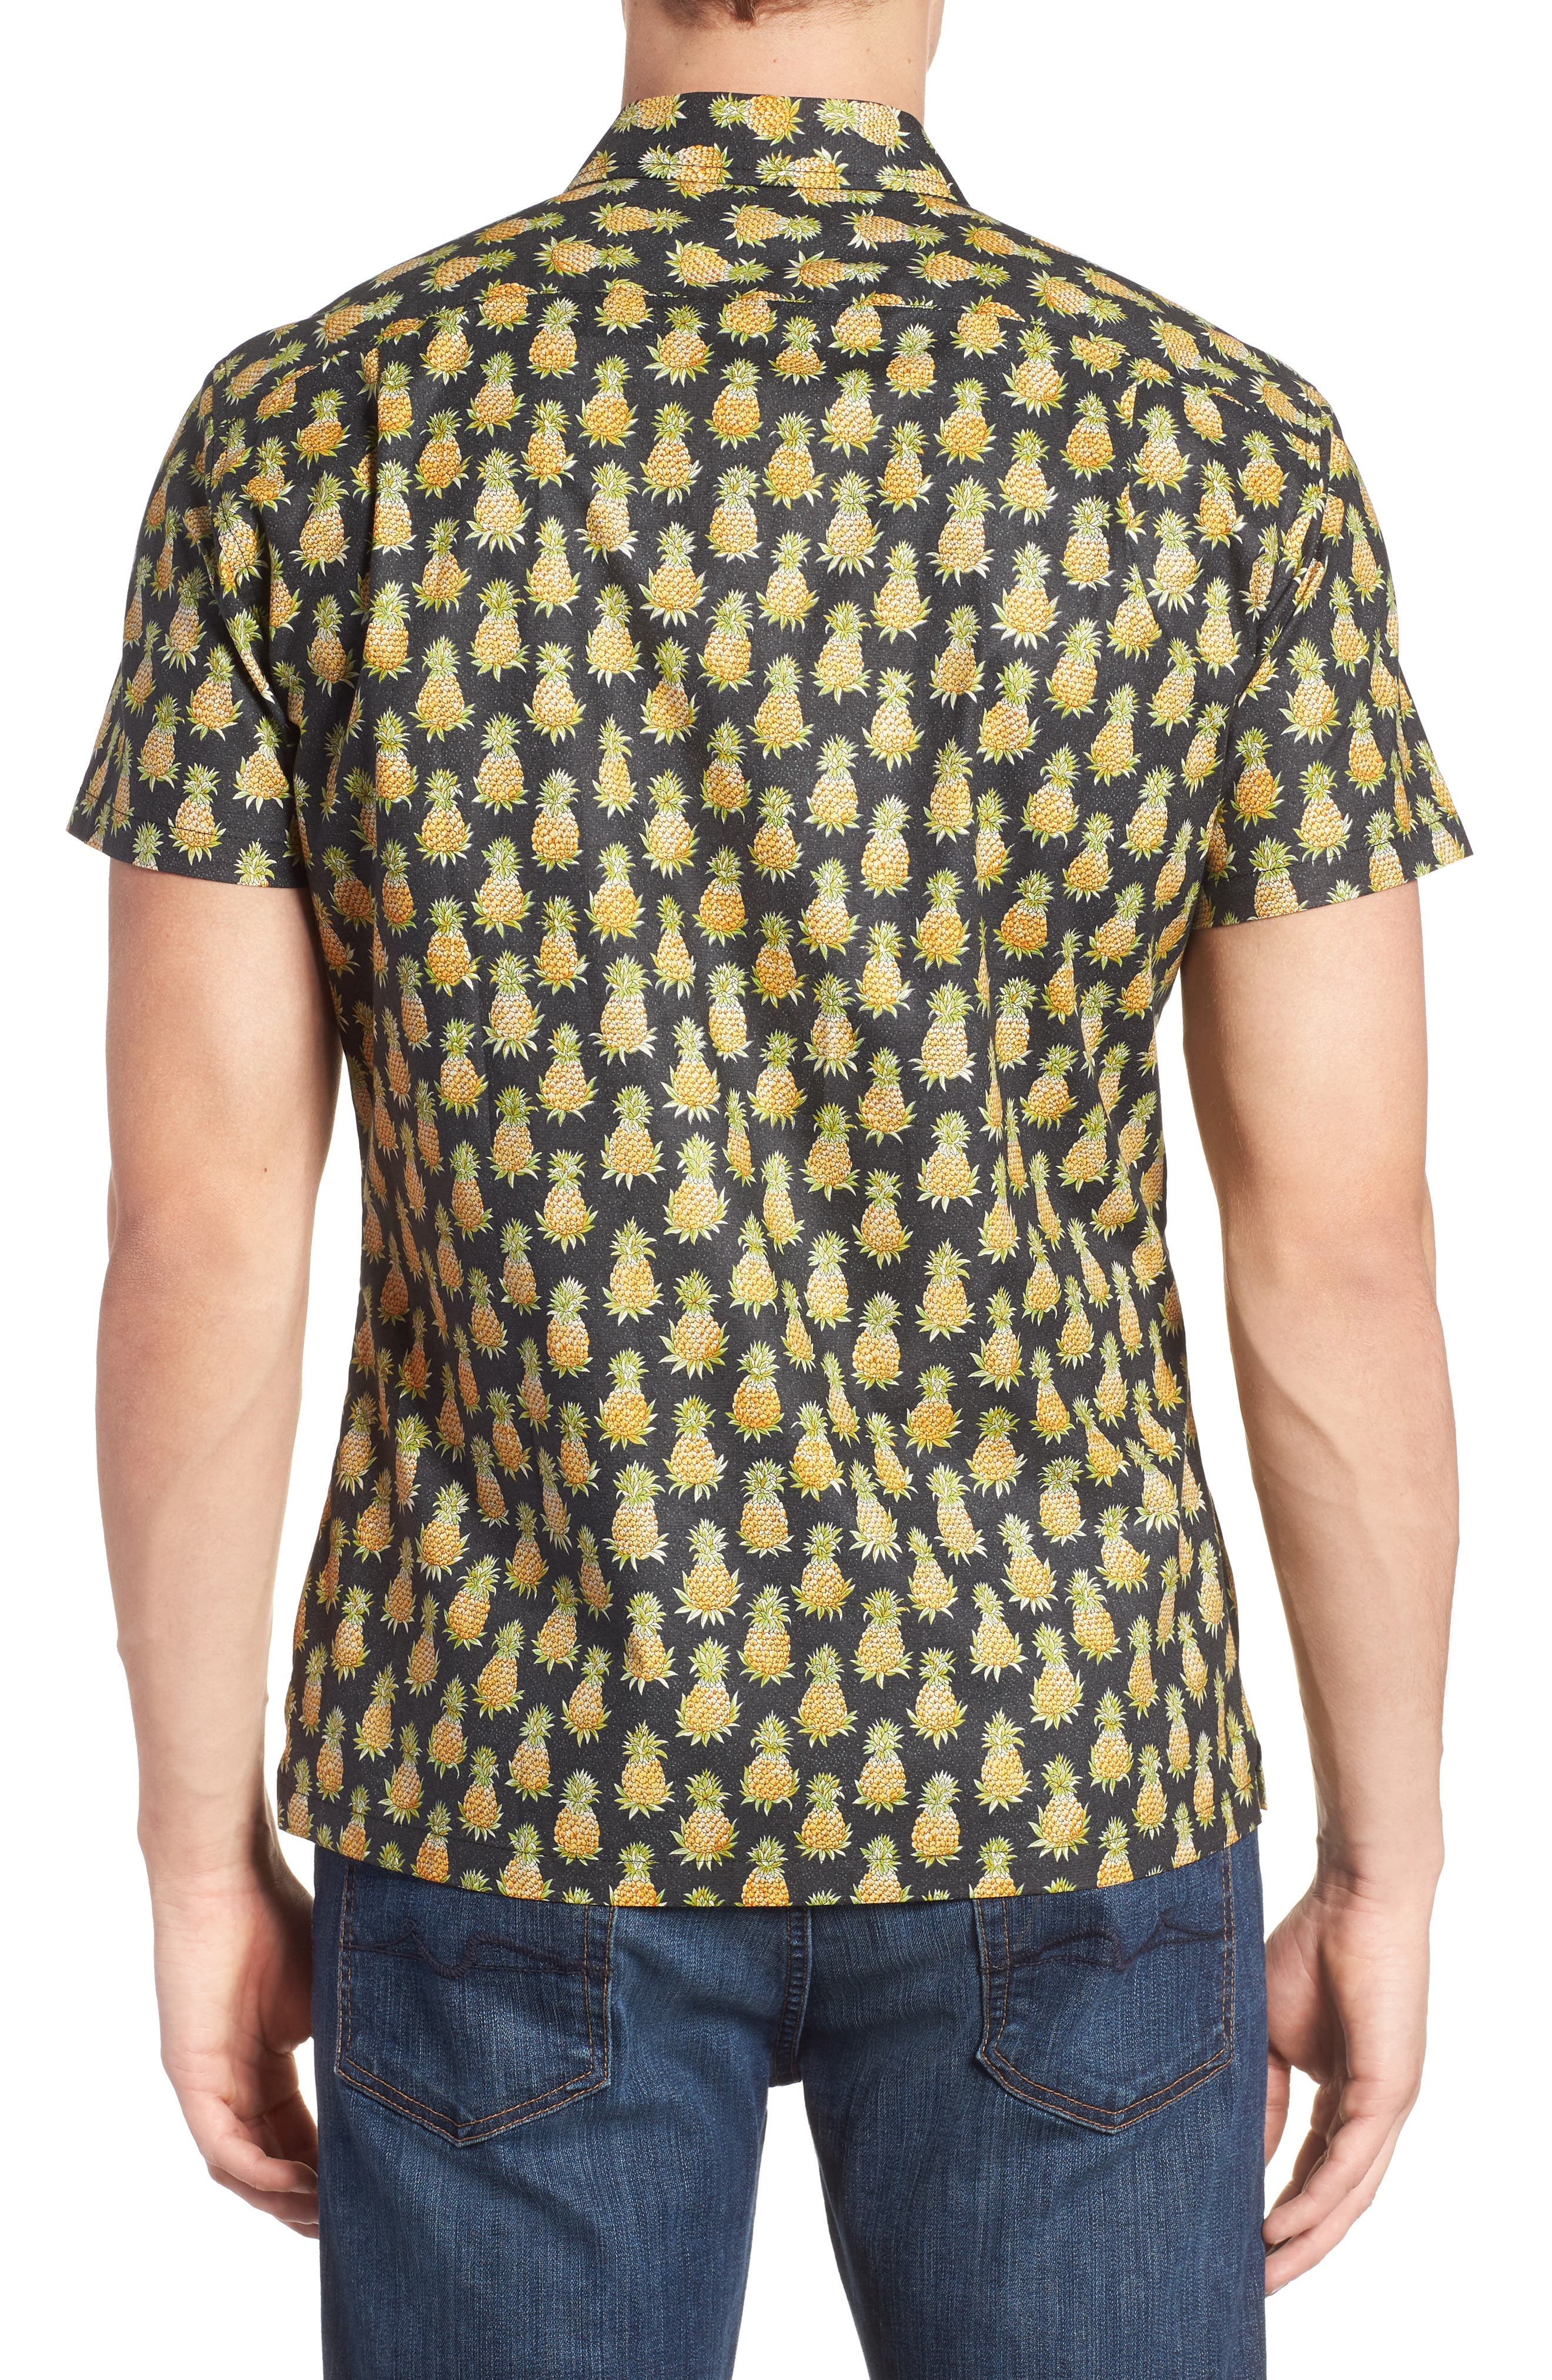 Pineaplism Trim Fit Camp Shirt,                             Alternate thumbnail 2, color,                             BLACK